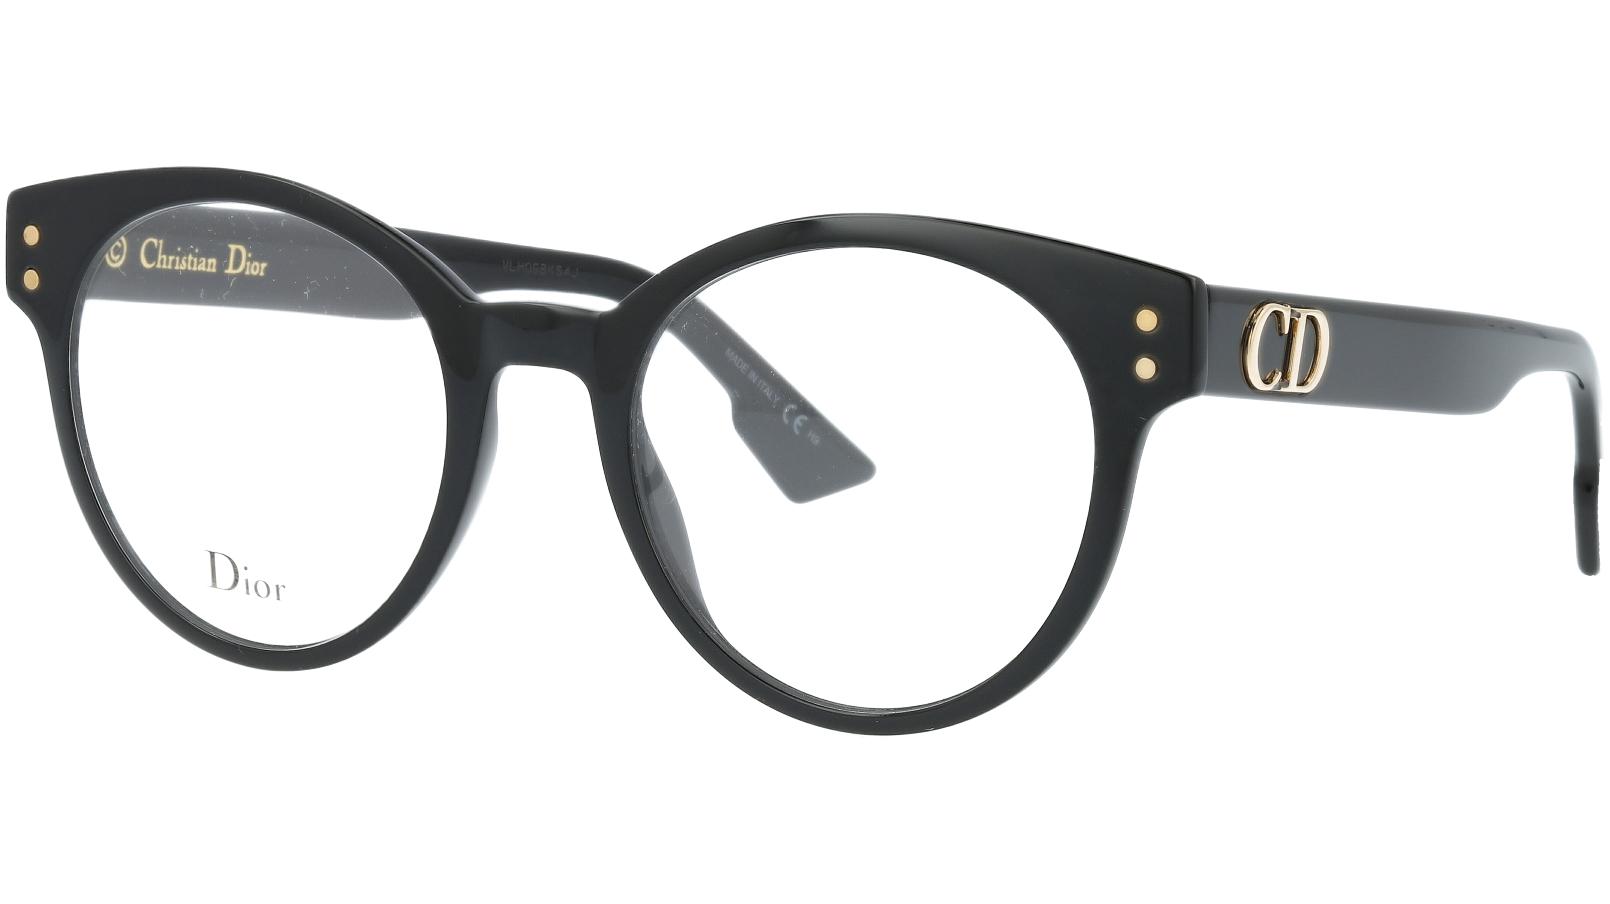 Dior CD3 807 49 Black Glasses